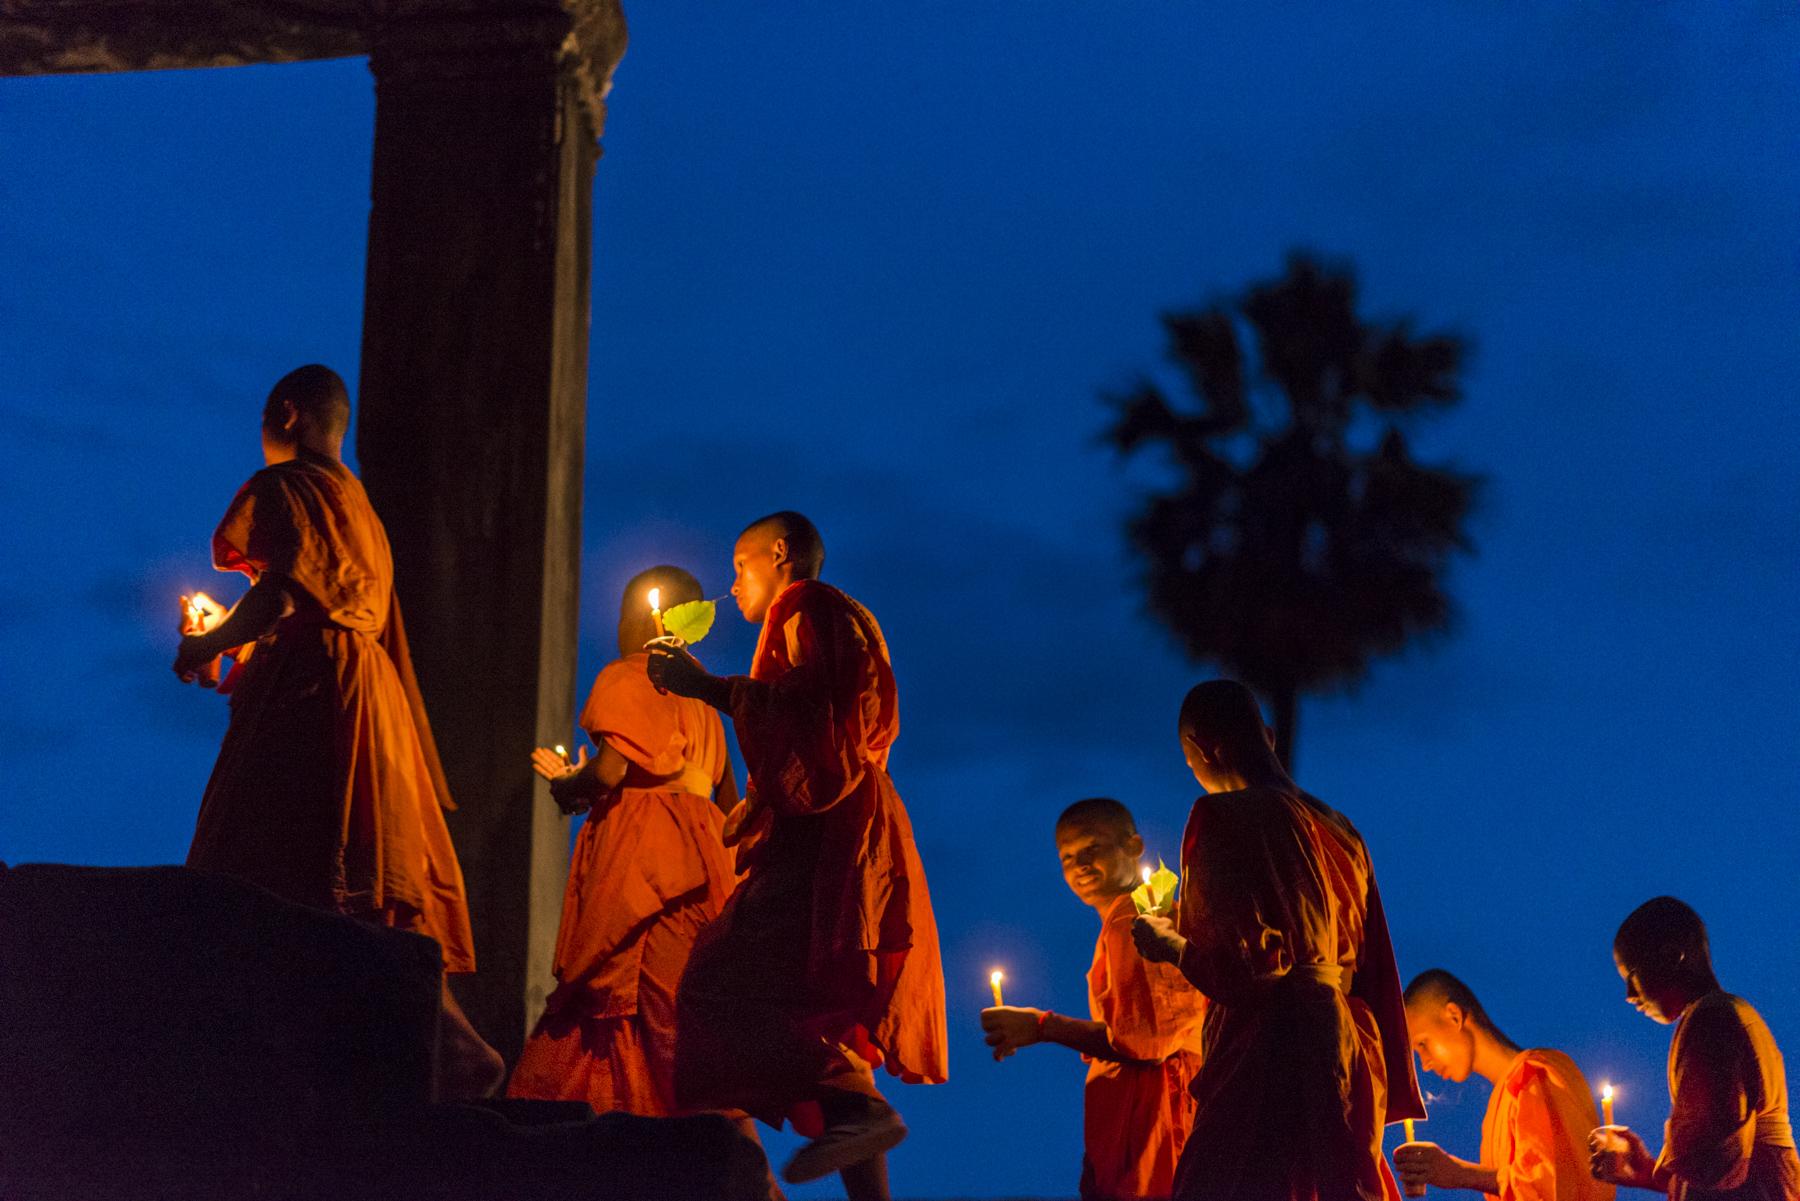 2016-05-20 Visek Bochea@Angkor Wat-0098.jpg